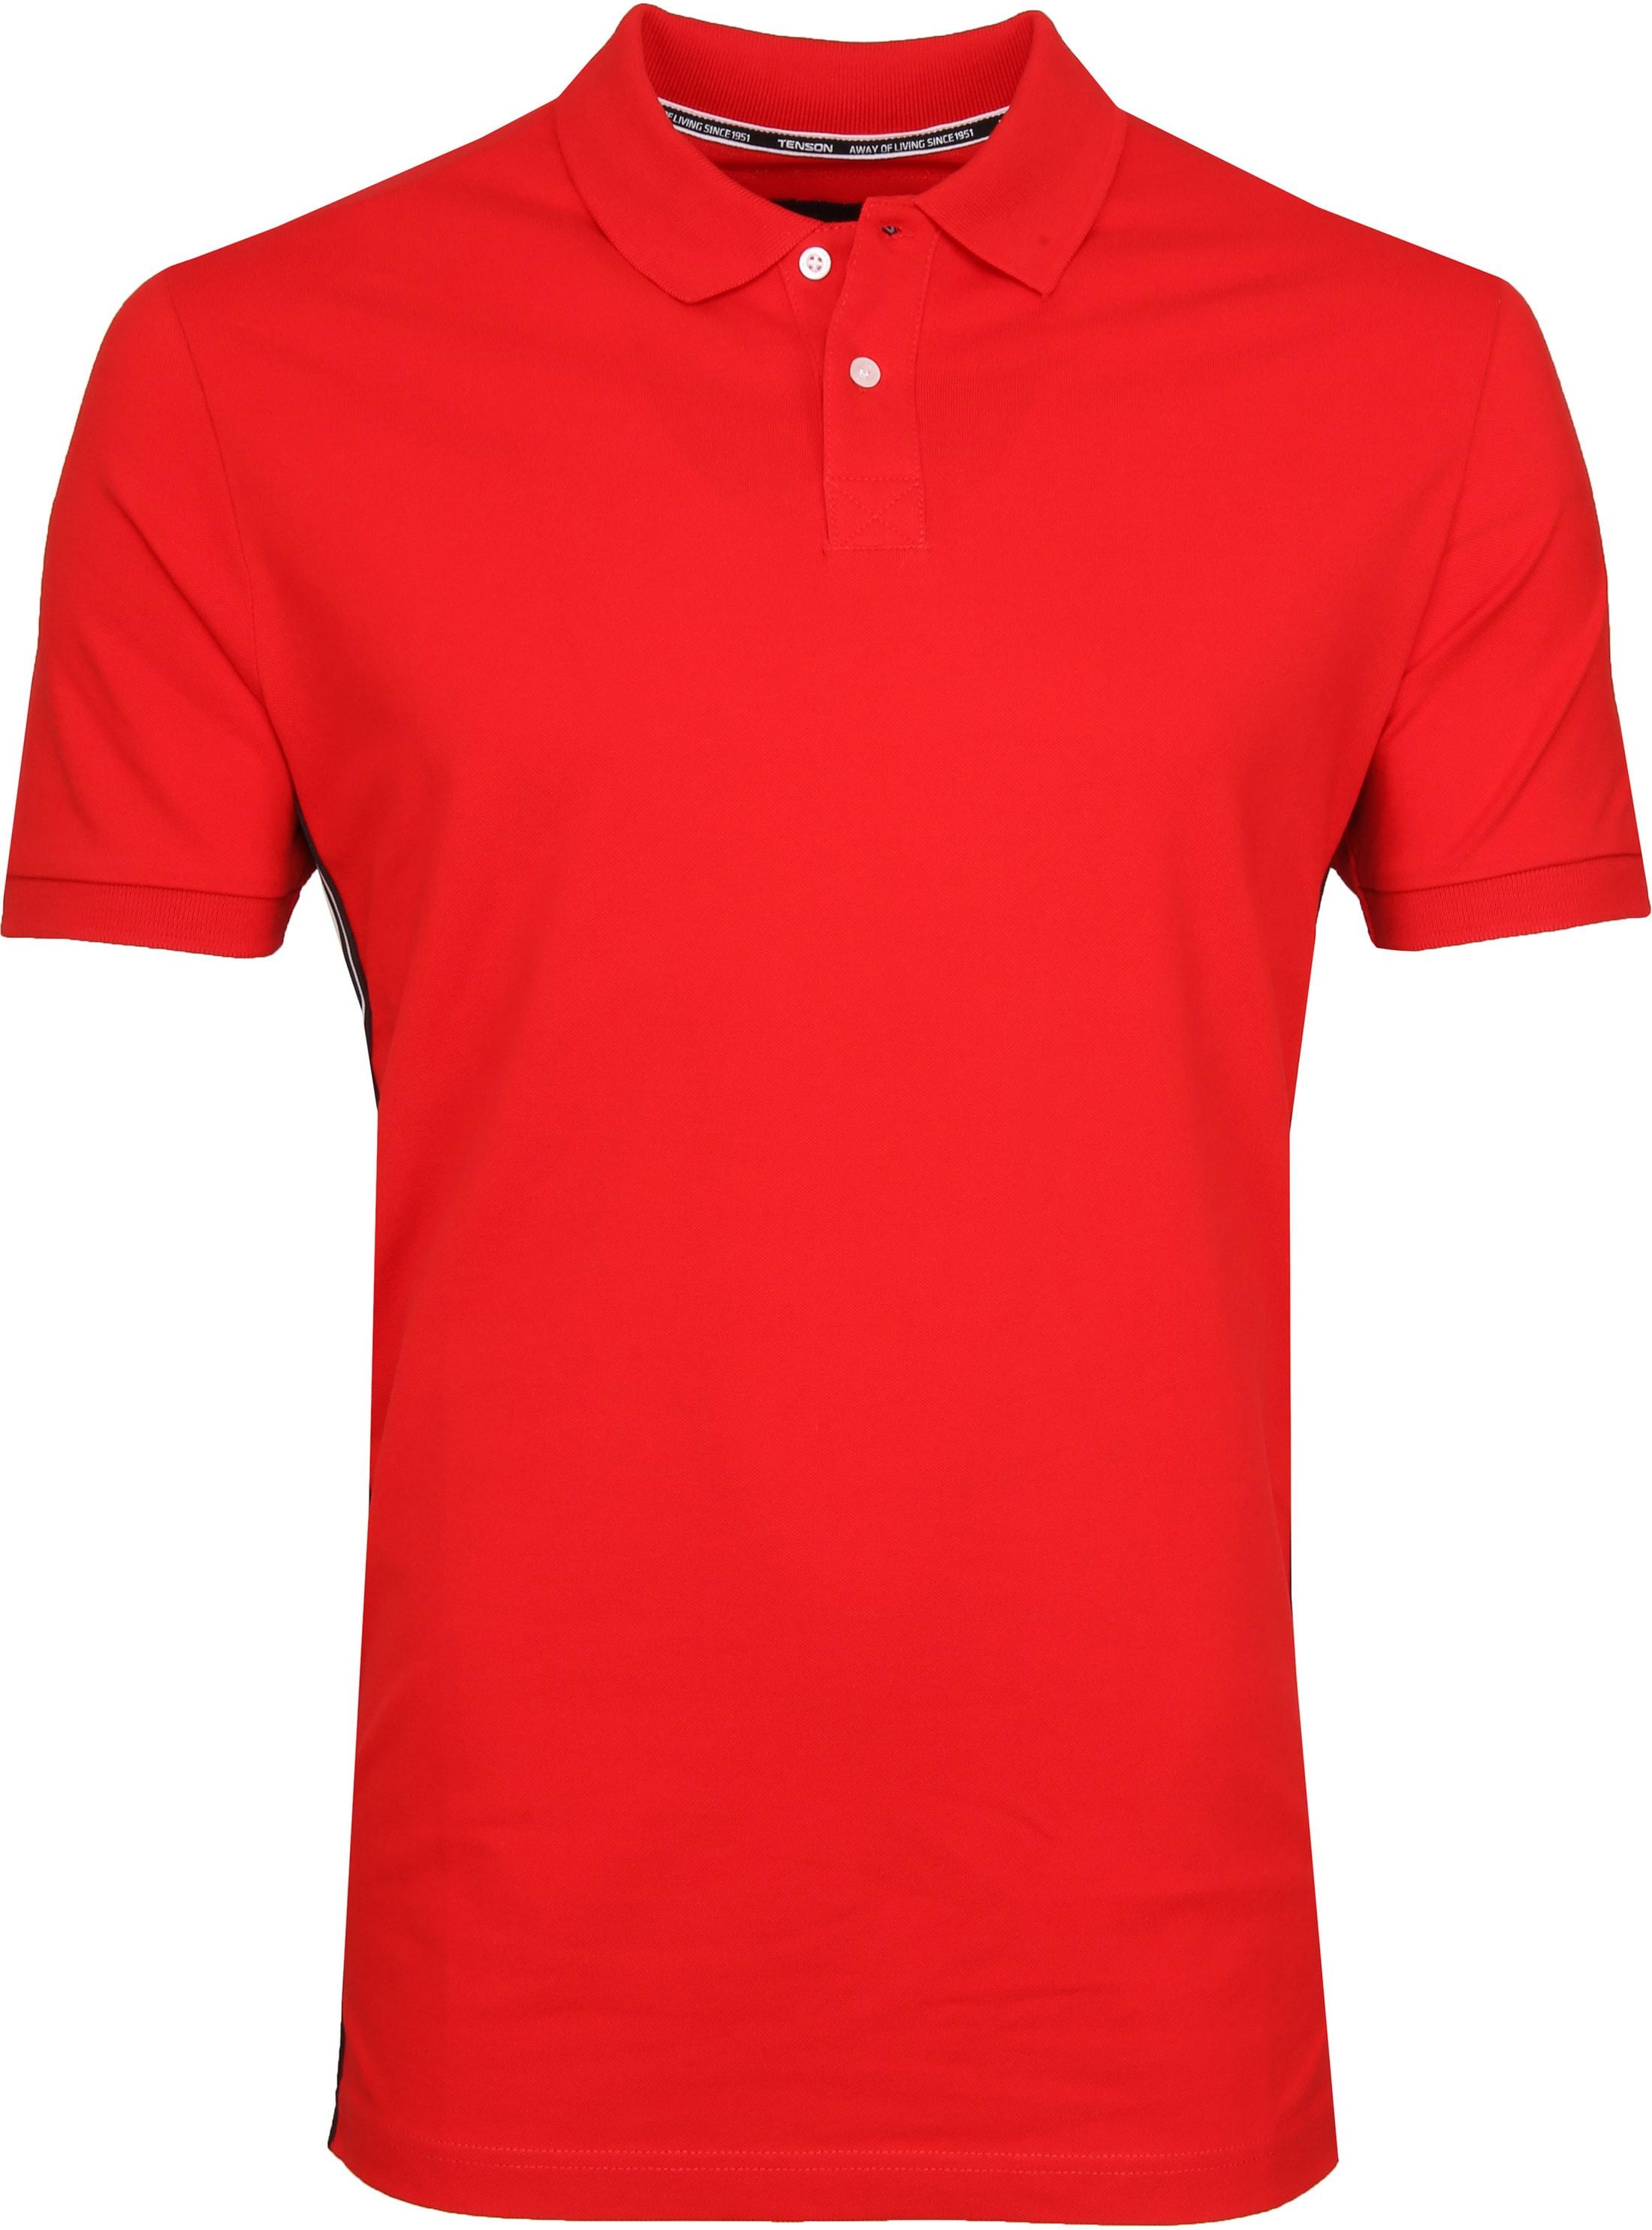 Tenson Poloshirt Zenith Red foto 0